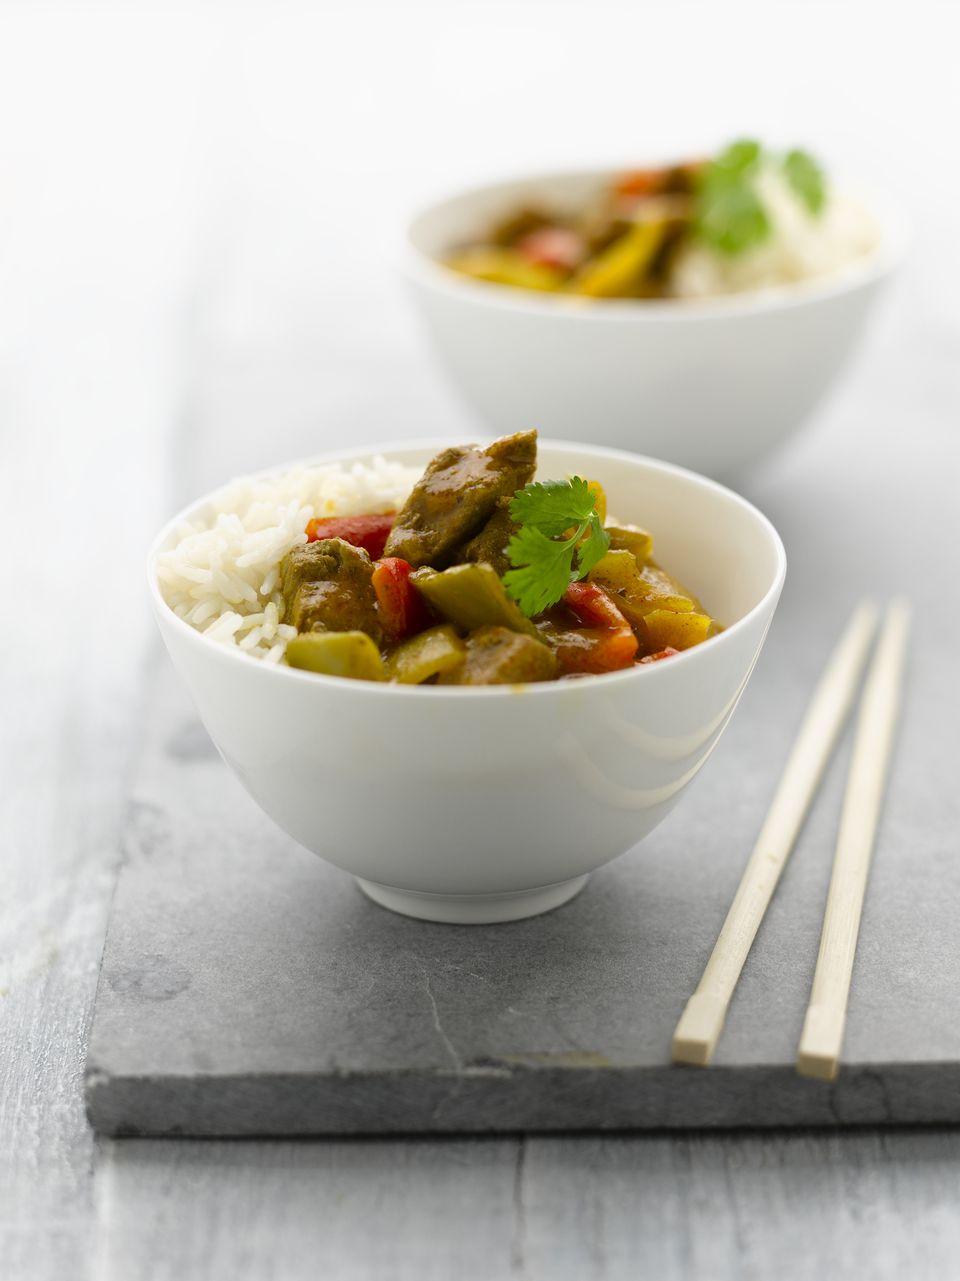 Pork curry rice